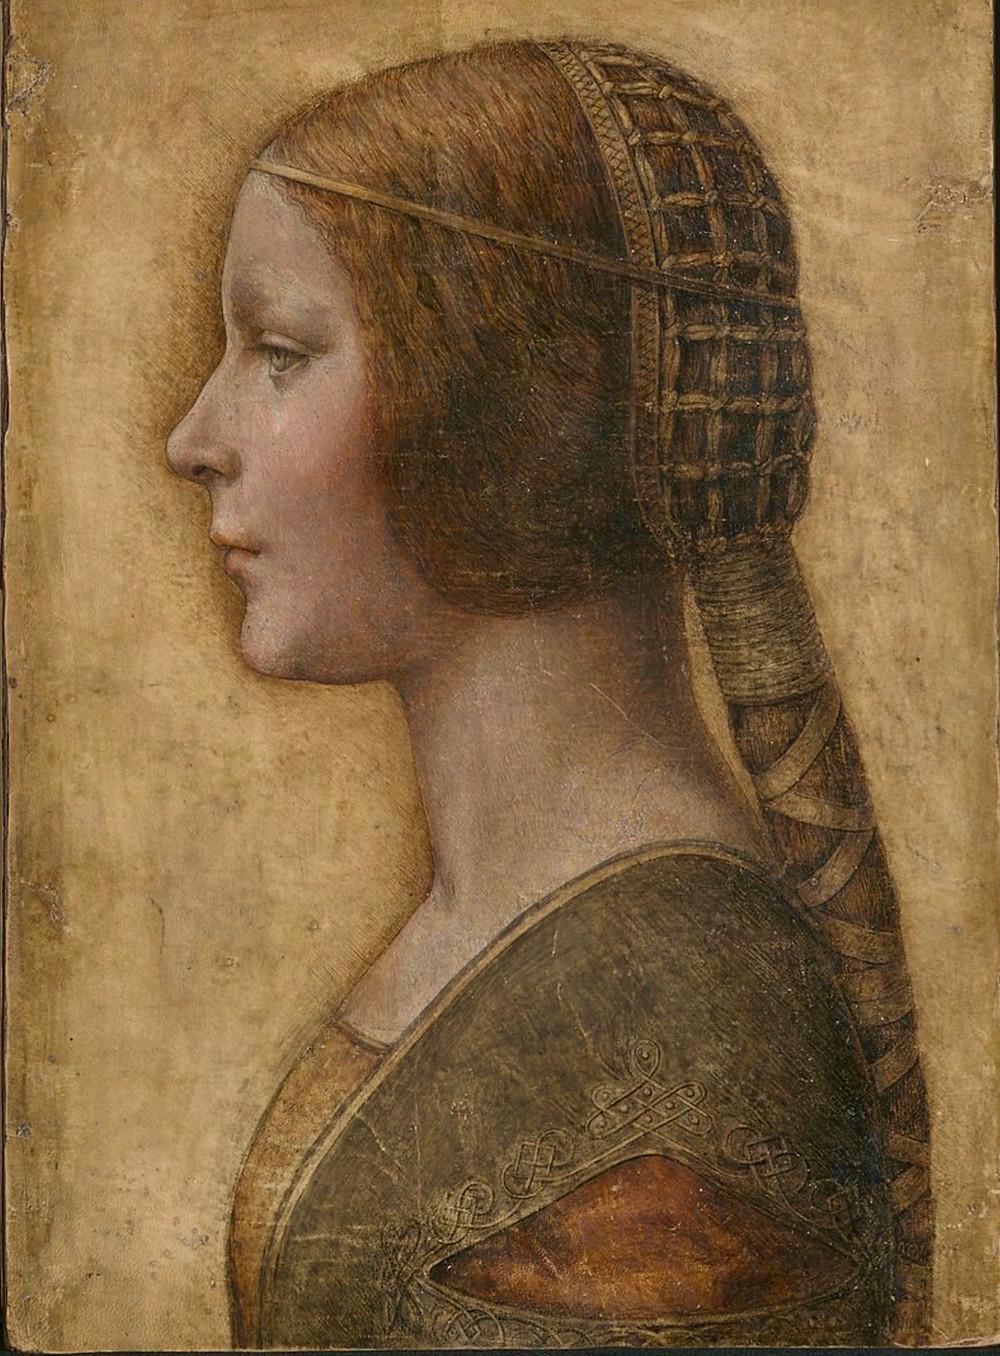 La Bella Principessa, circa 1480-90 -- a possible Leonardo